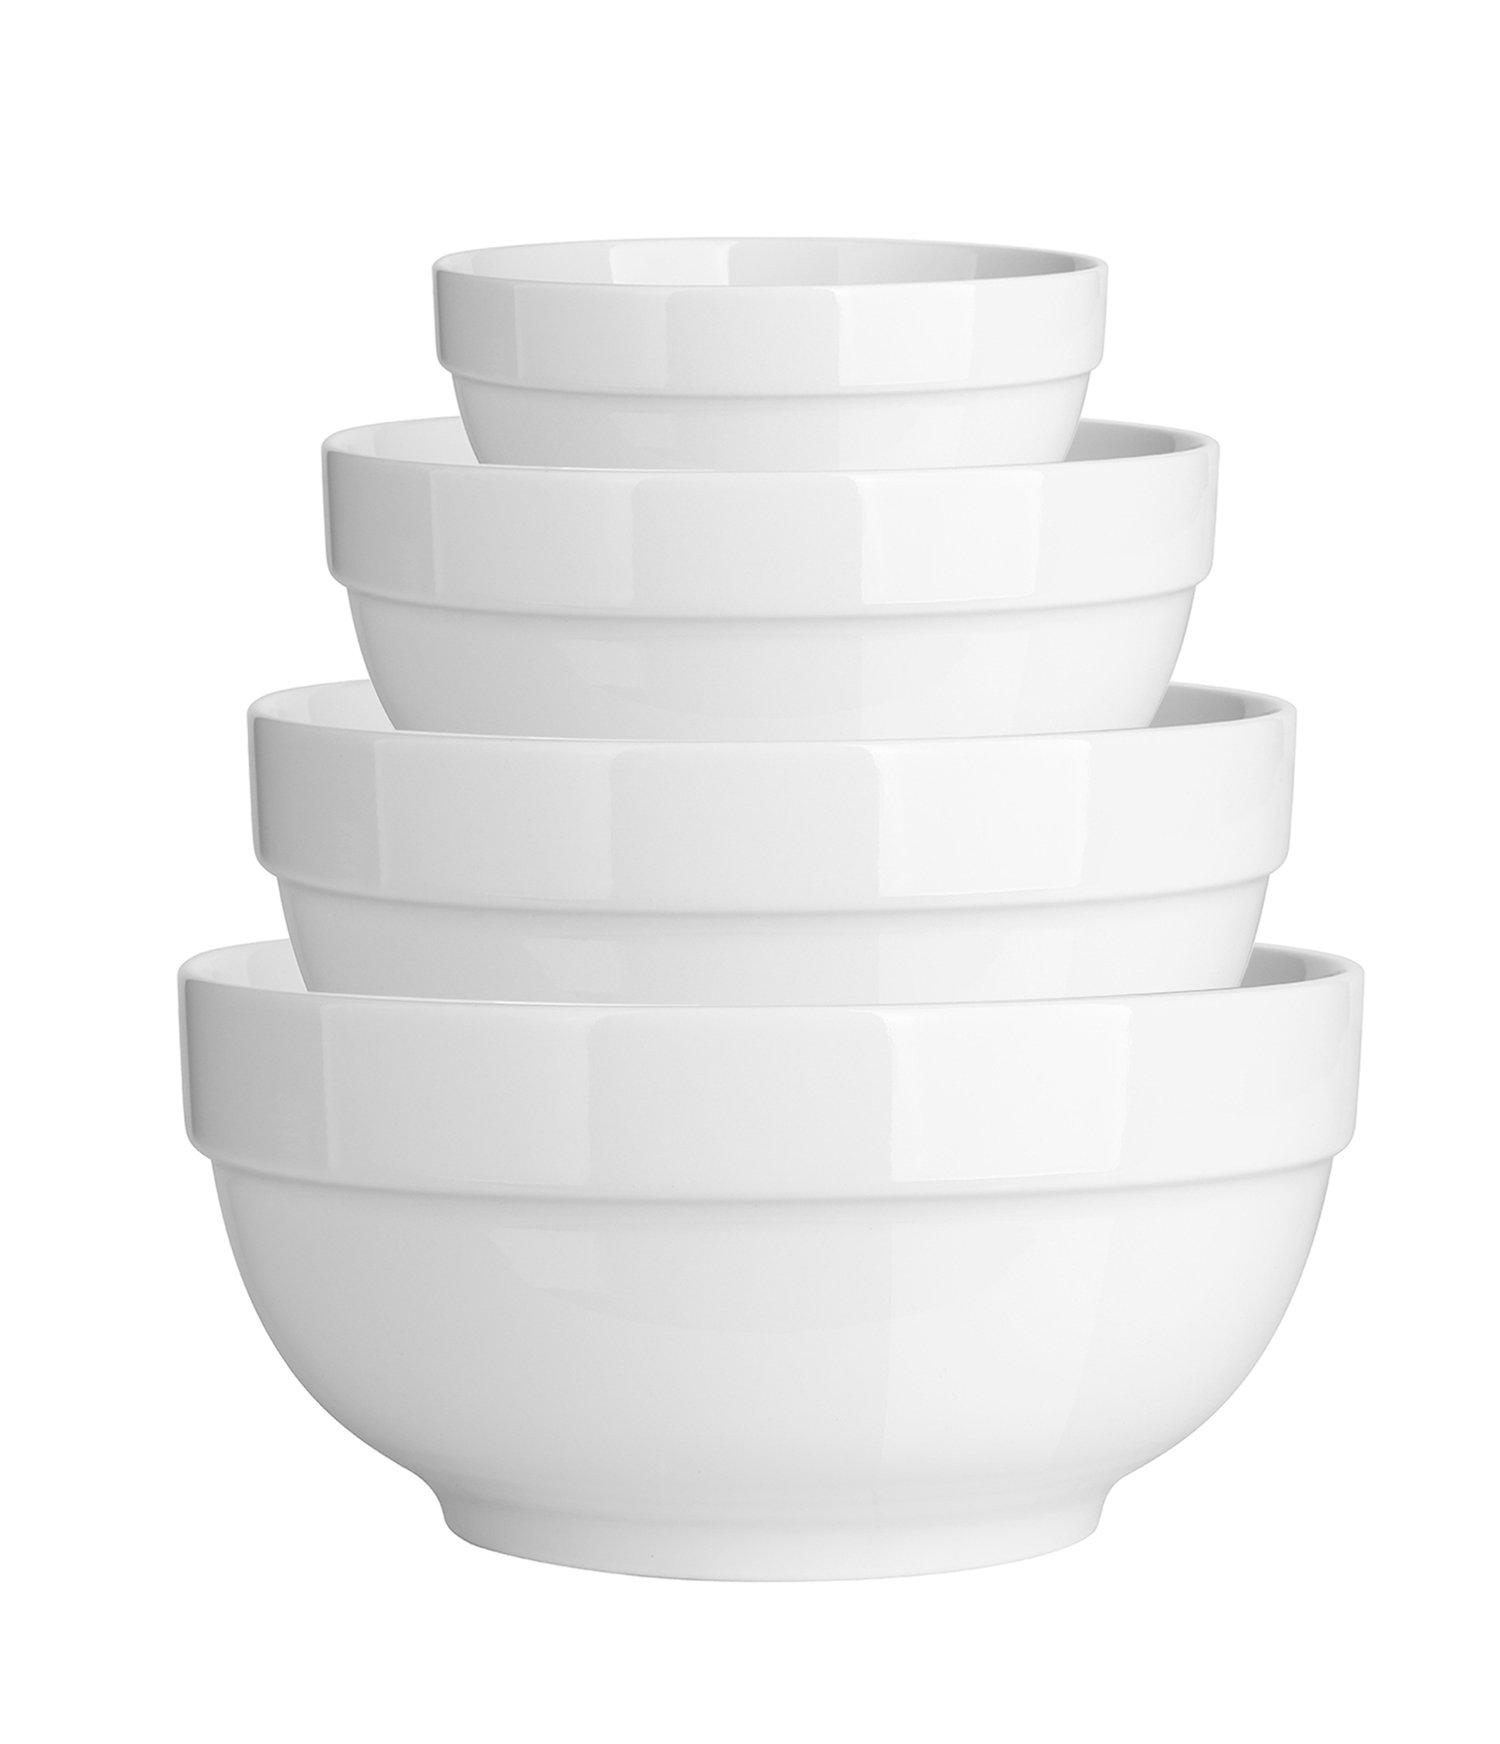 DOWAN 4 Pieces Porcelain Serving Bowl Set, White Bowls, Cereal Bowl Set, Small Bowl Set, Microwave Safe, Ideal for Cereals, Dessert,Soup, Ice Cream